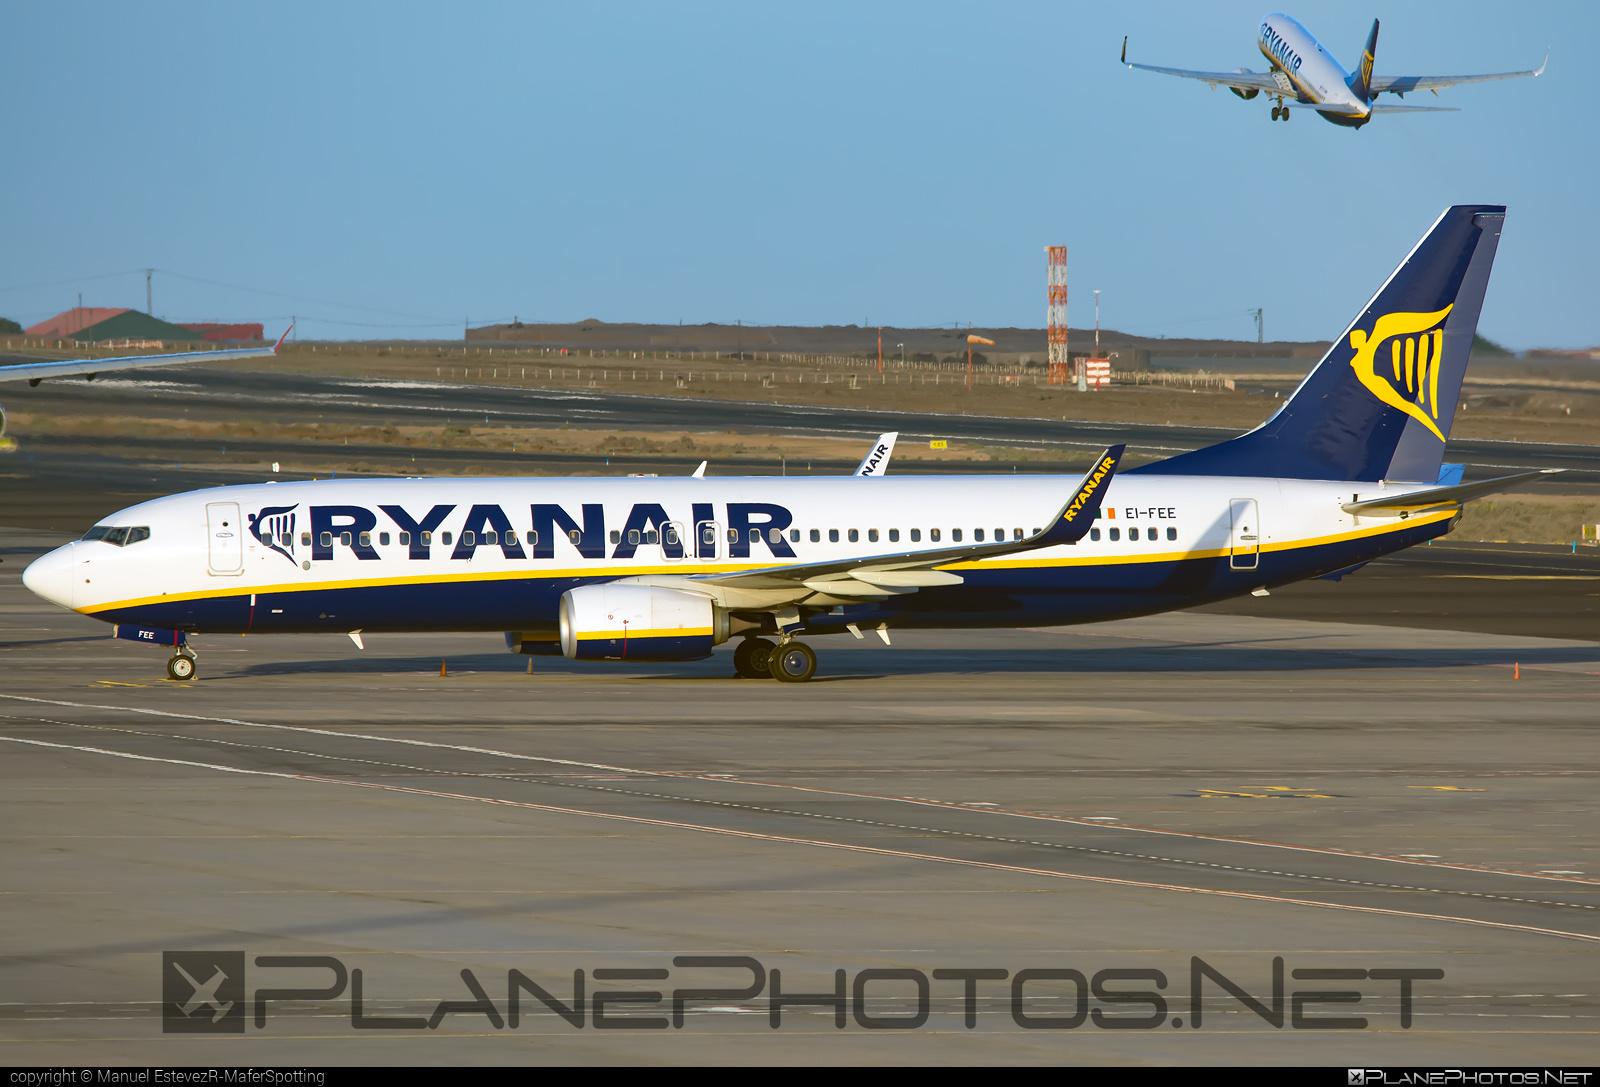 Boeing 737-800 - EI-FEE operated by Ryanair #b737 #b737nextgen #b737ng #boeing #boeing737 #ryanair